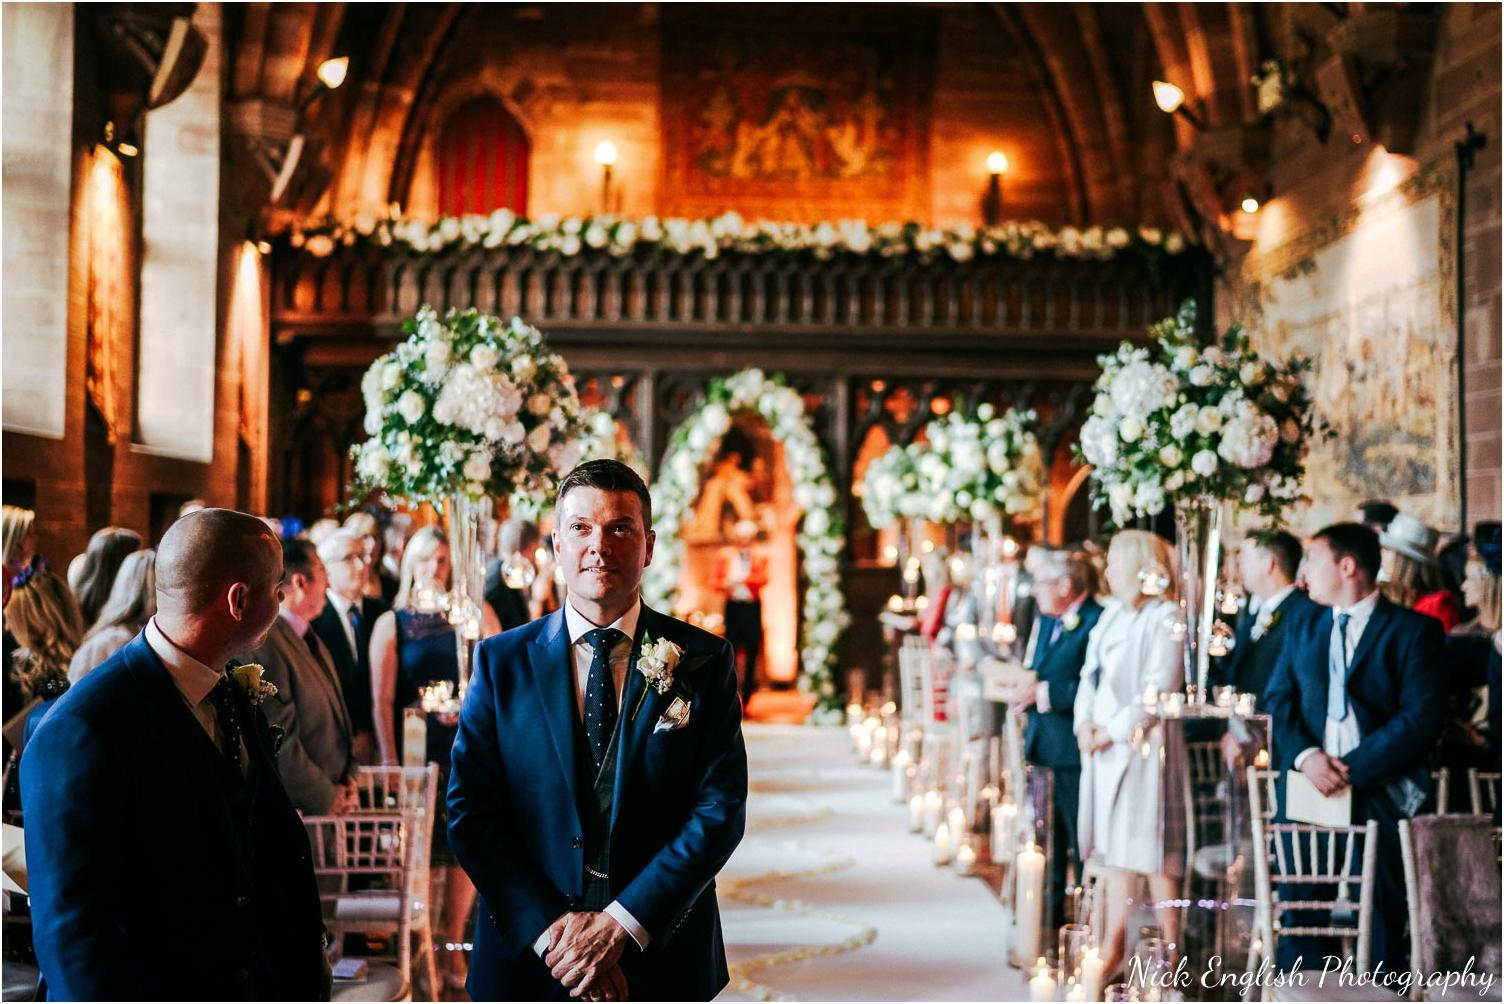 Peckforton_Castle_Winter_Wedding-26.jpg